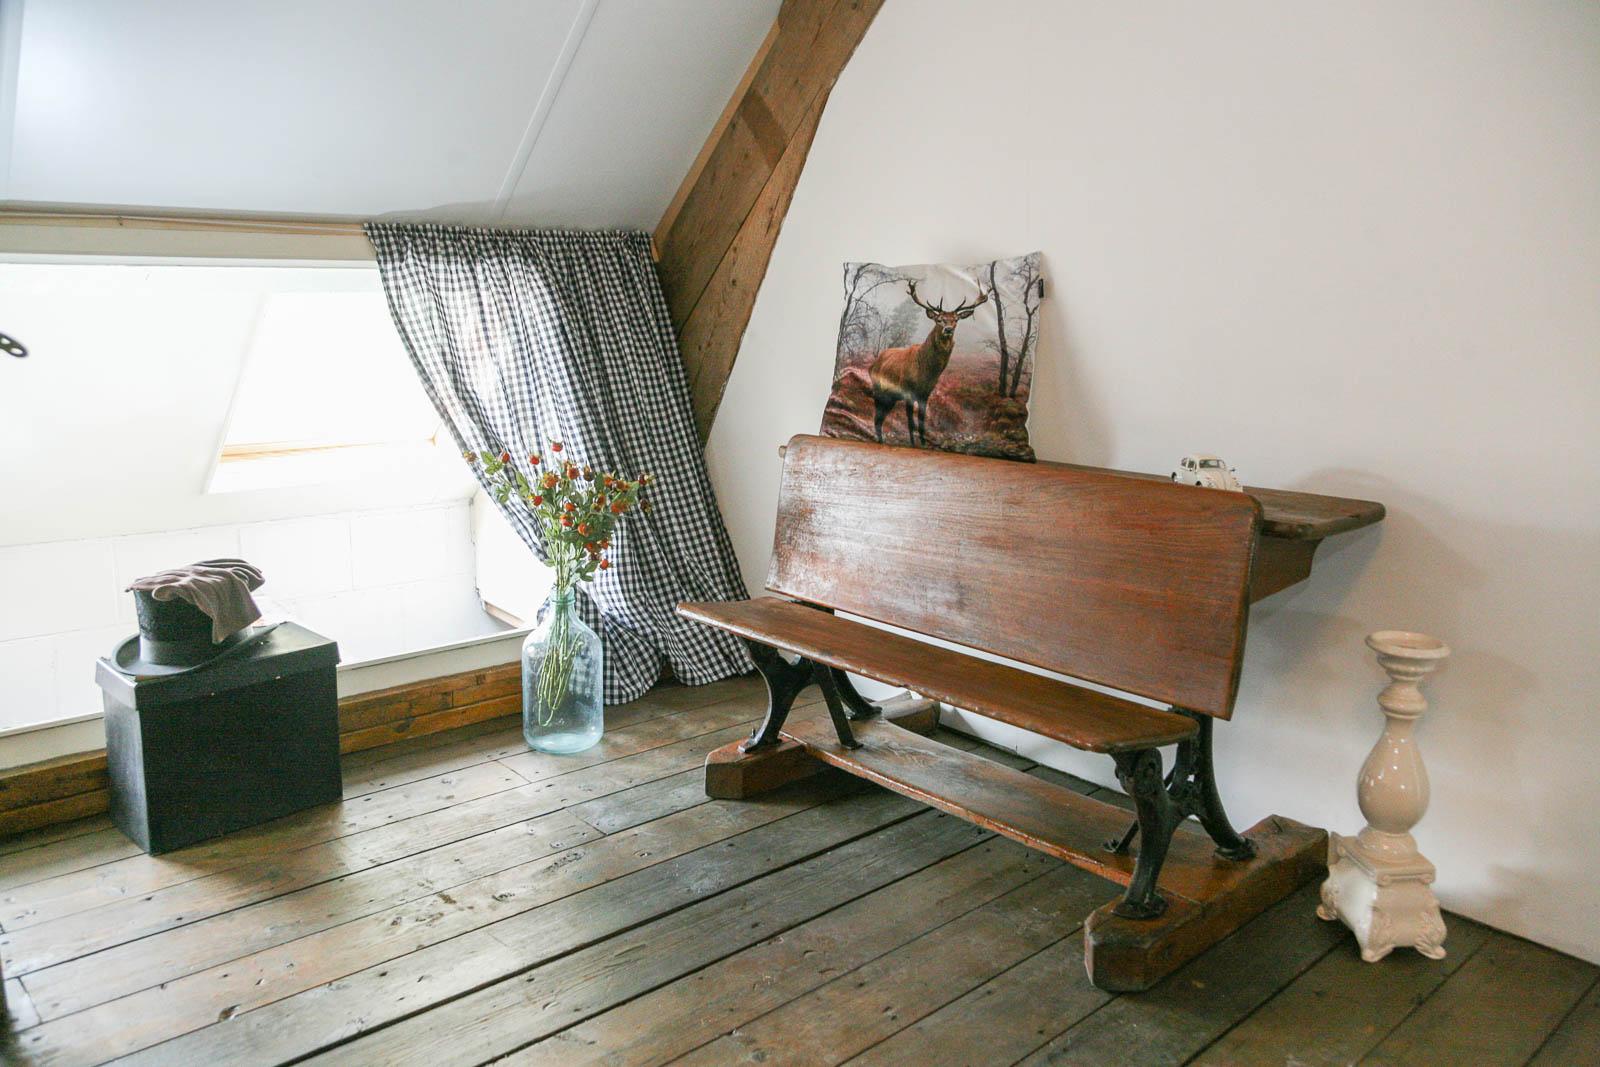 Hillegondahoeve-De Oude Stal-1464